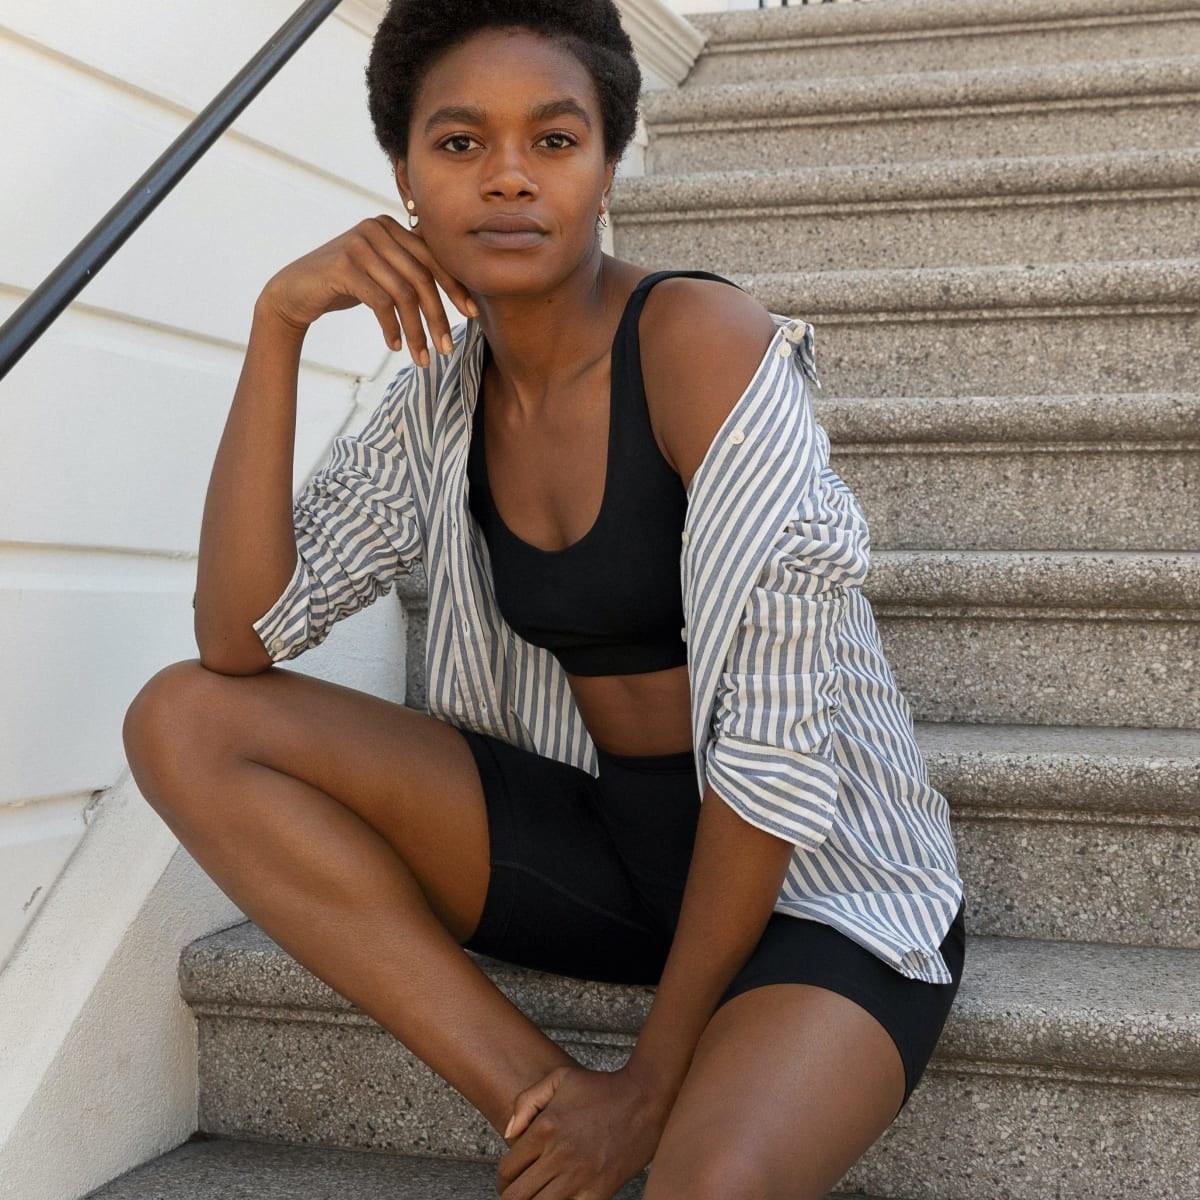 model in black mid-length bike shorts